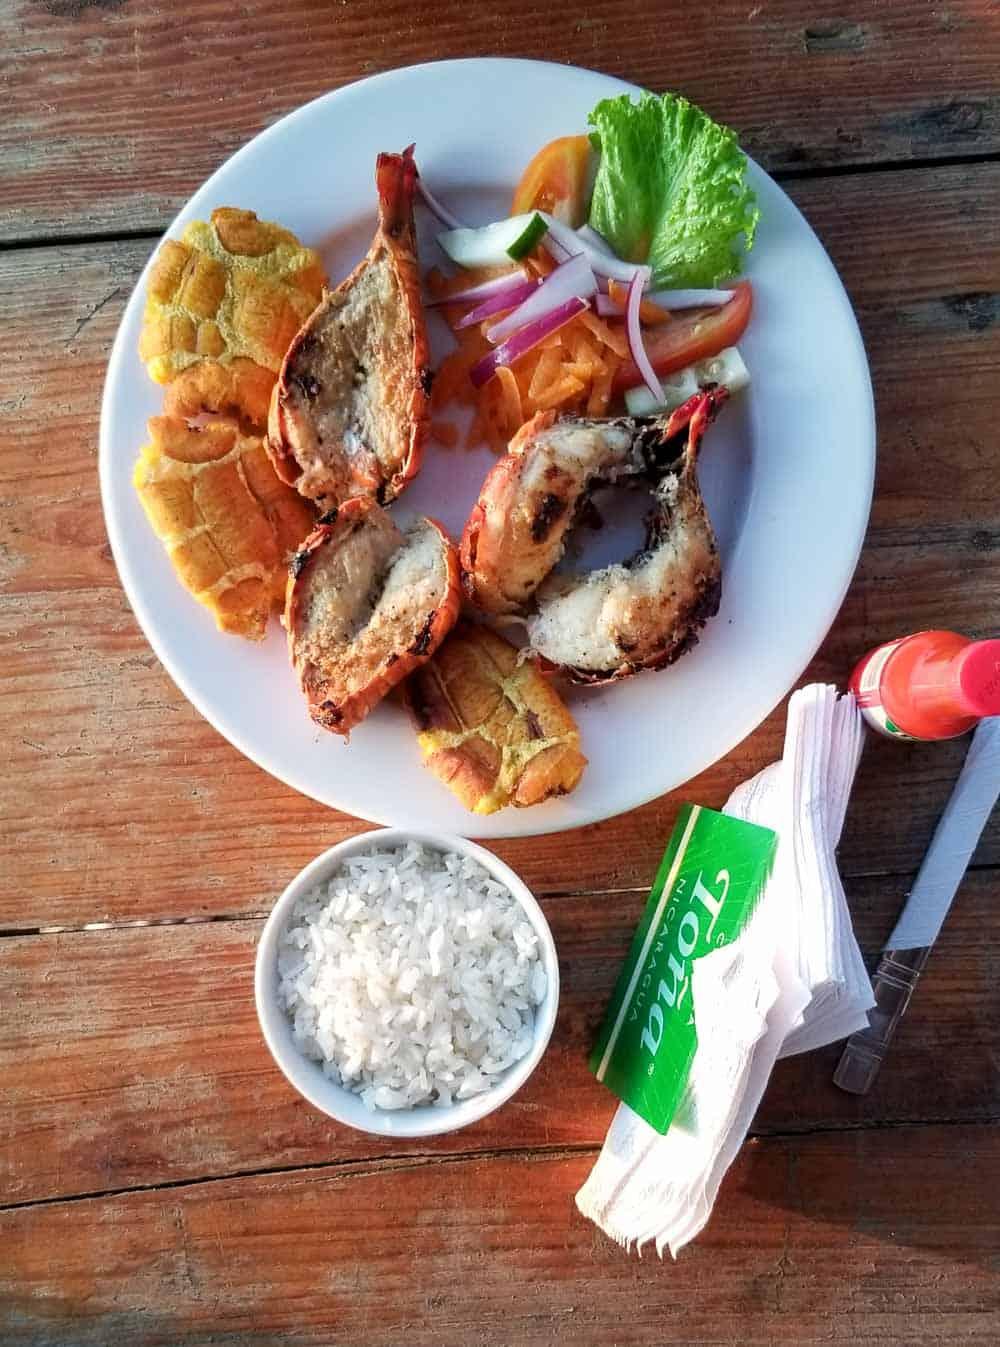 Beach Side Lobster on Playa Marcella Nicaragua